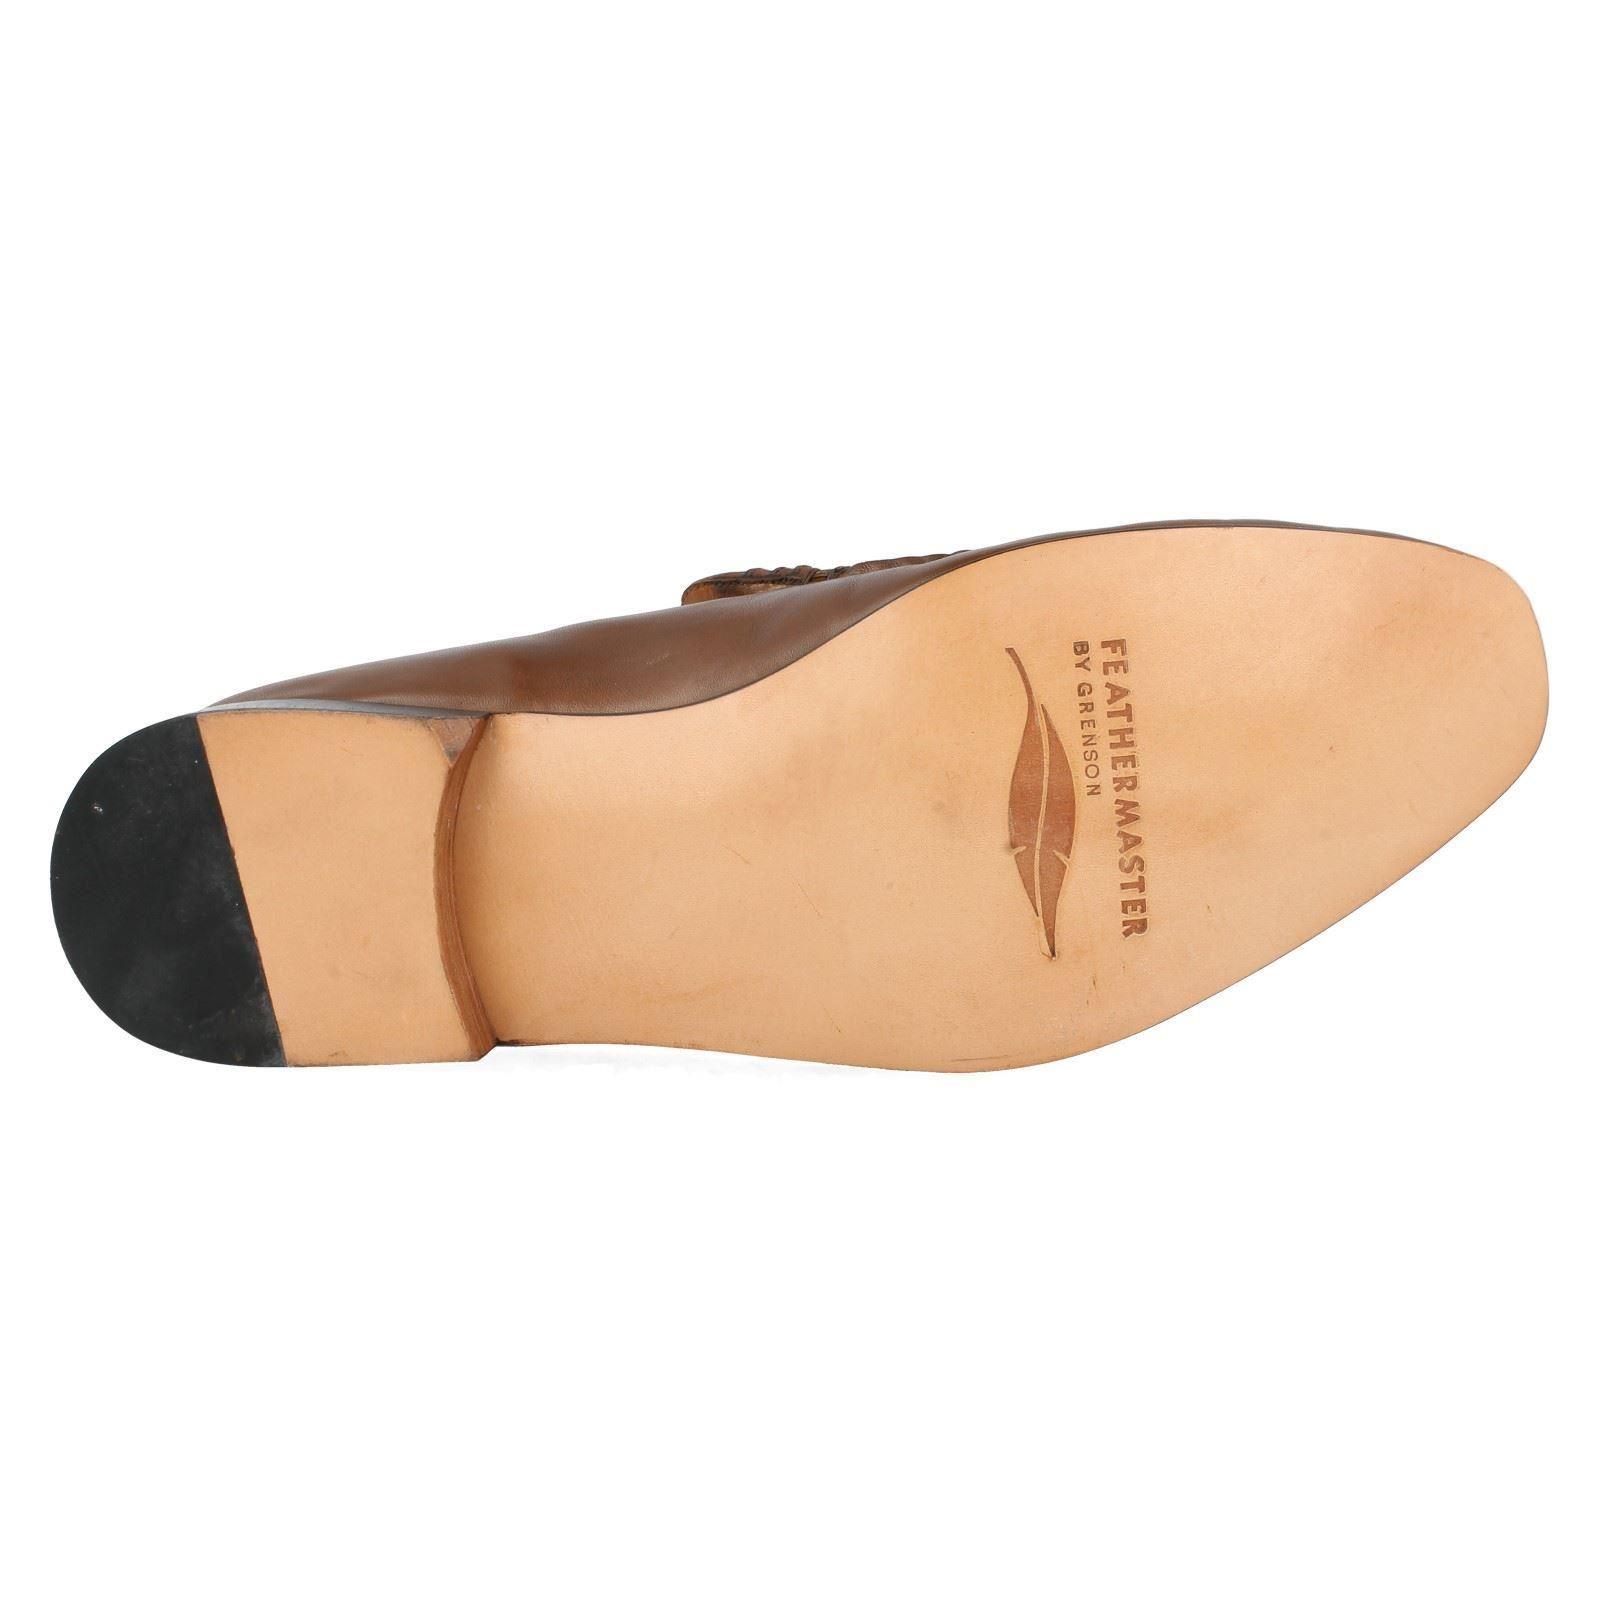 Mens Grenson Slip Slip Slip On Leather F Fit Moccasin Formal Shoes Idaho 9682 865cc9